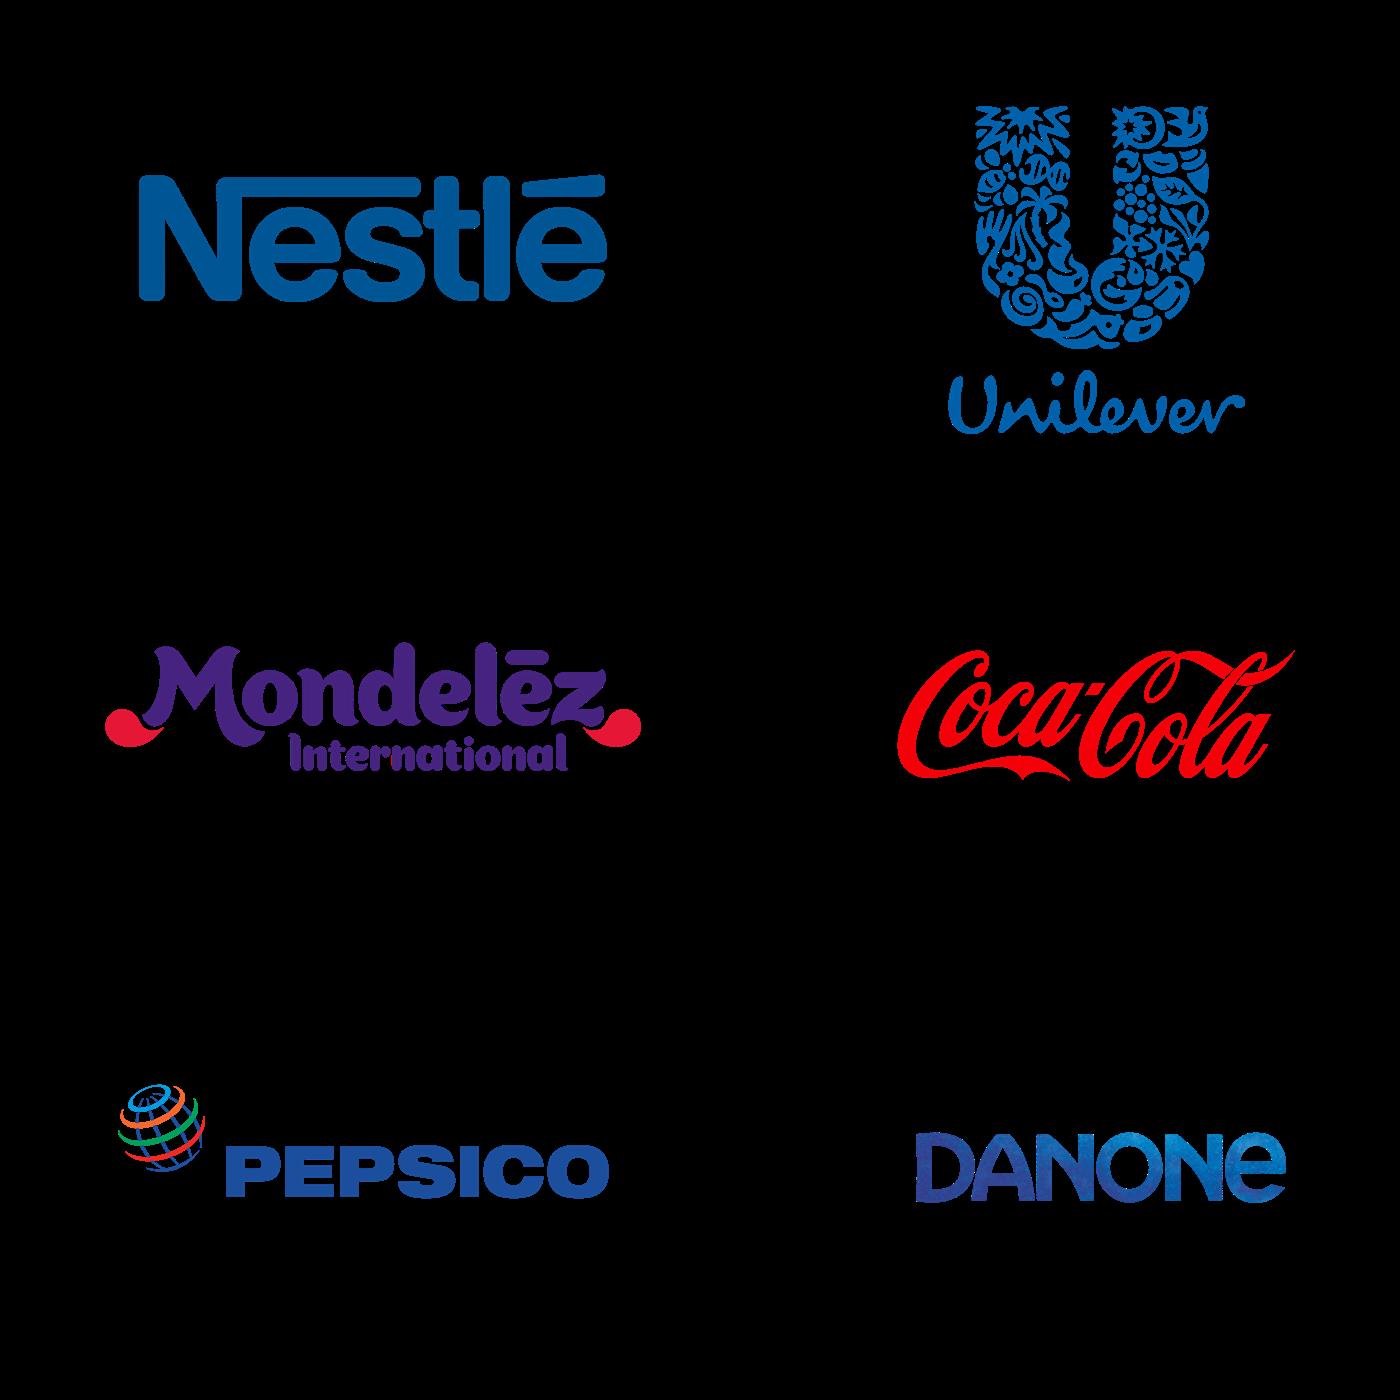 Nahrungsmittelkonzerne Nestle, Unilever, Mondelez, Coca-Cola, PepsiCo - Fundamentale Aktienanalyse